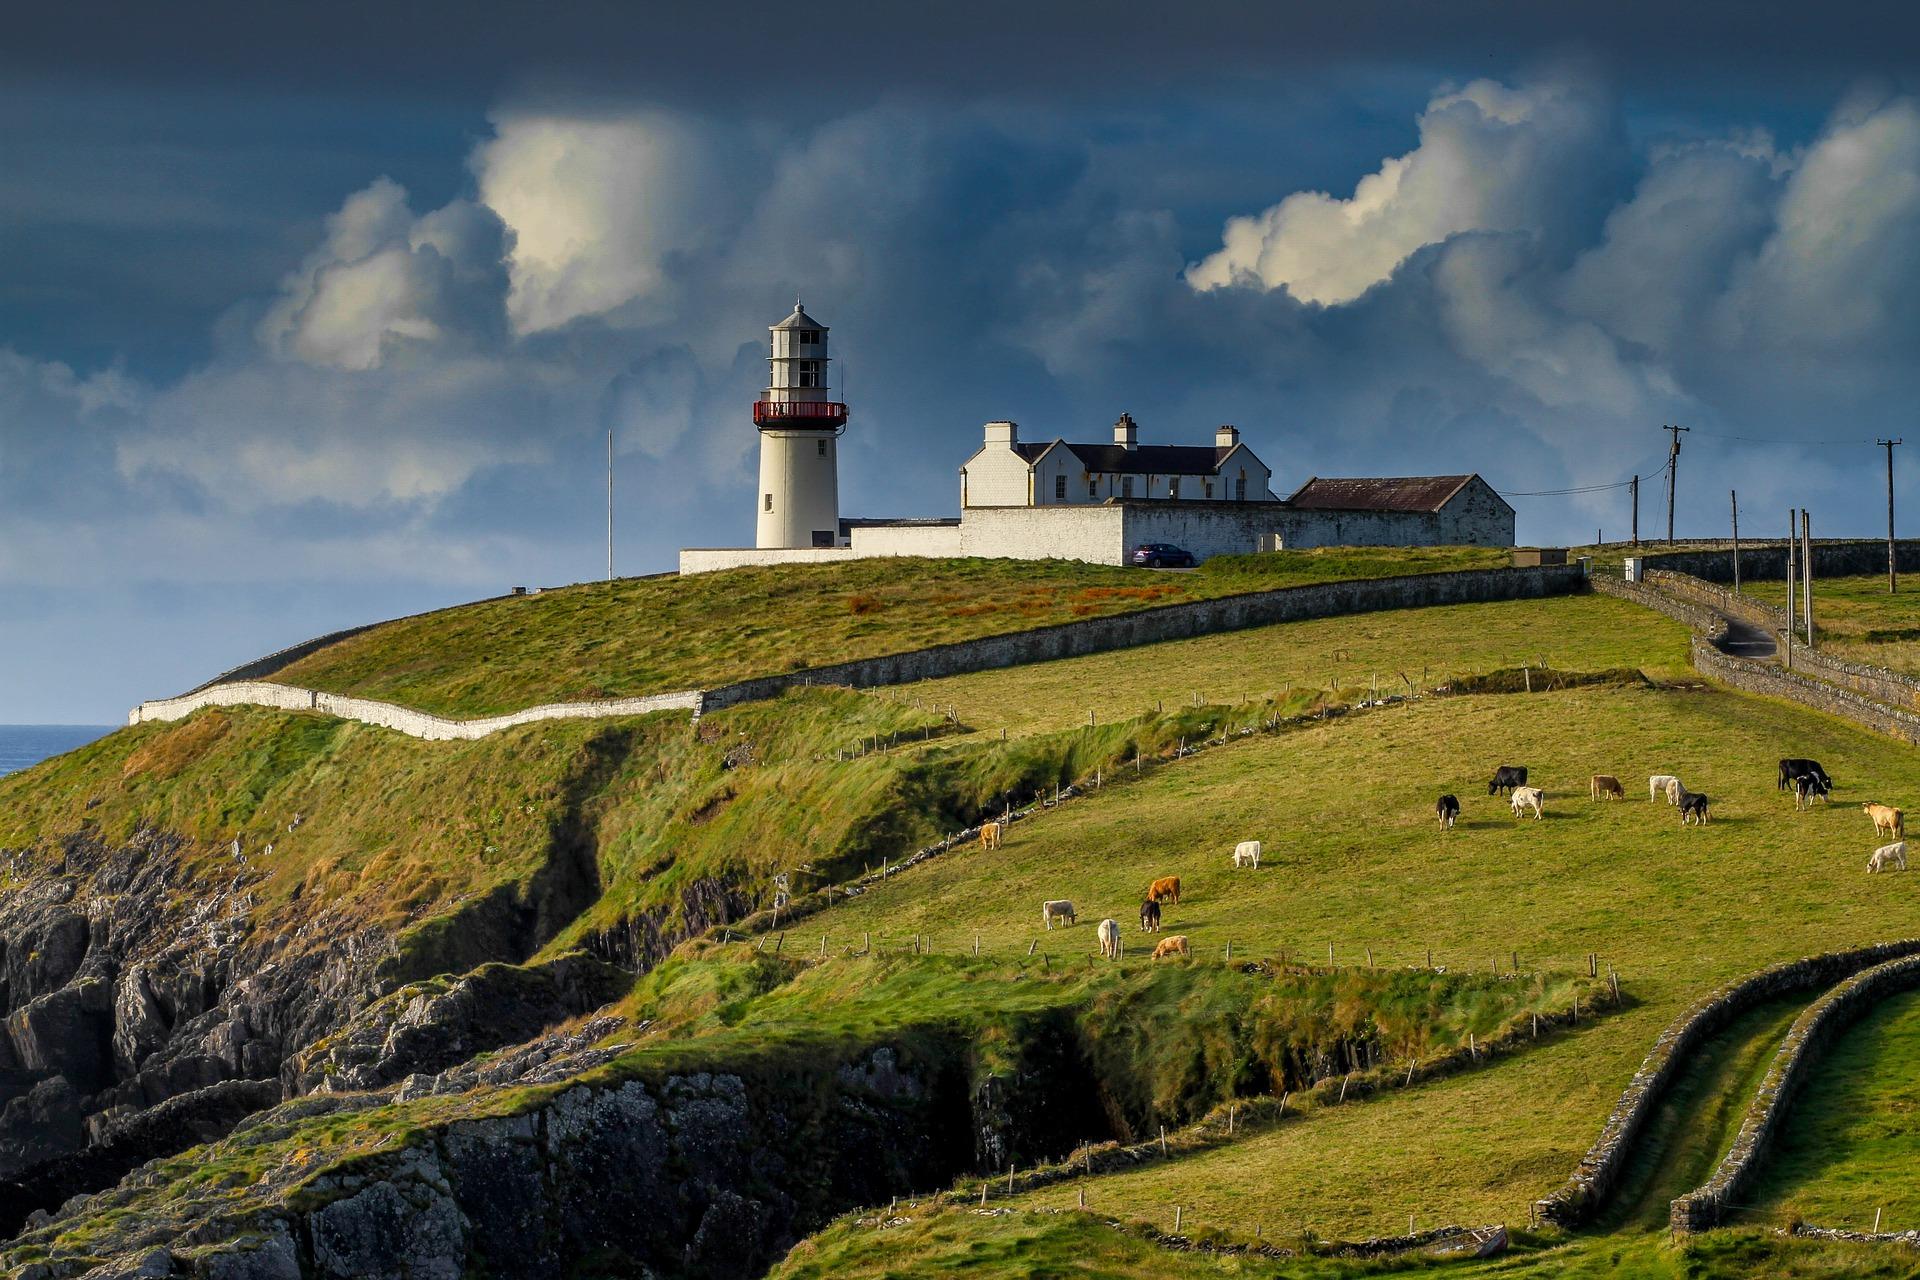 lighthouse-2542726_1920.jpg